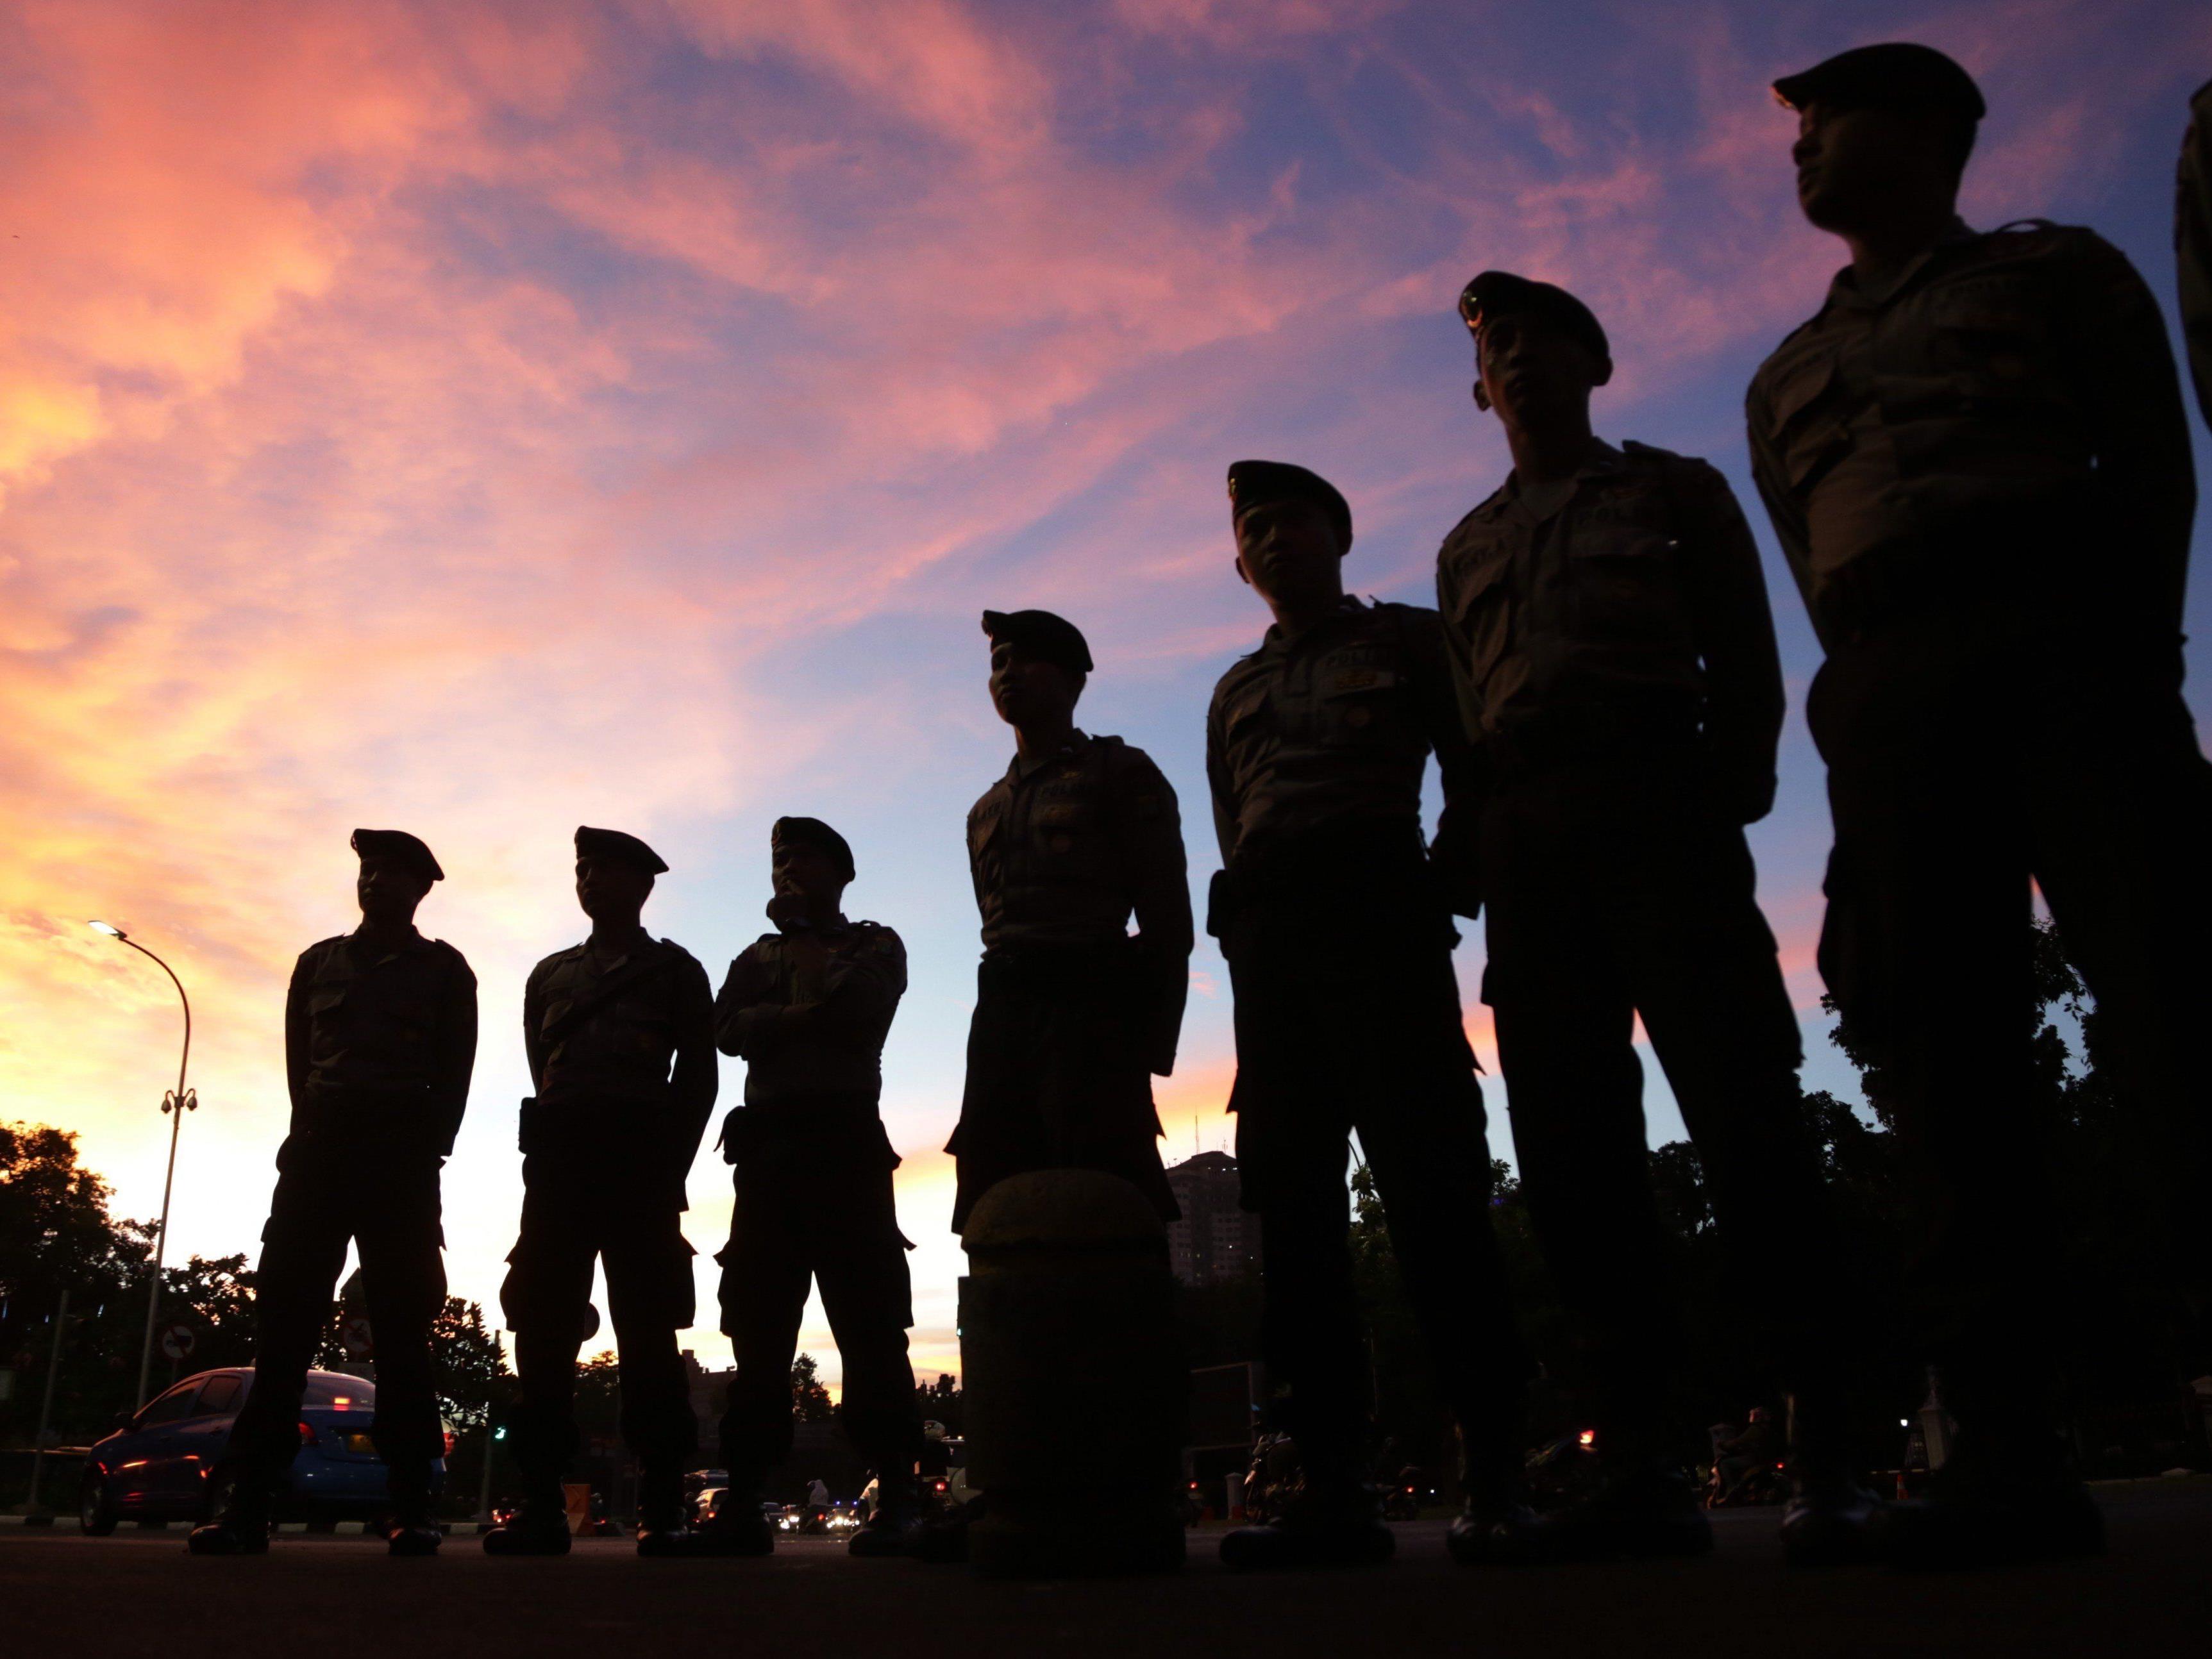 In Indonesien wurden Drogenschmuggler hingerichtet.